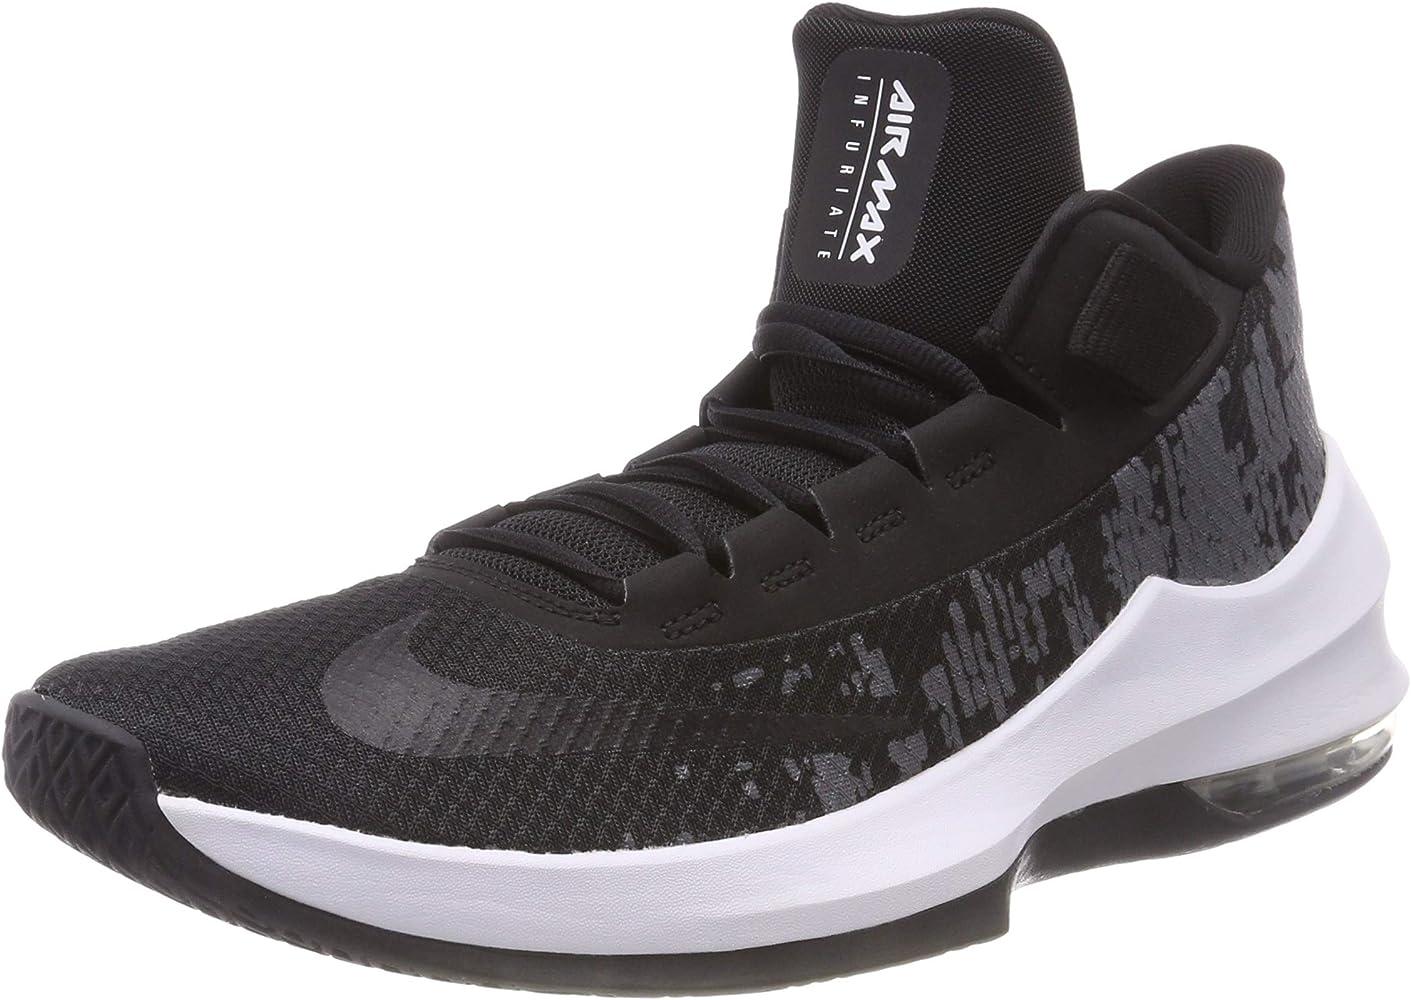 e8768b4ba21c6 Men's Air Max Infuriate 2 Mid Basketball Shoe Black/White-Anthracite, 7.5